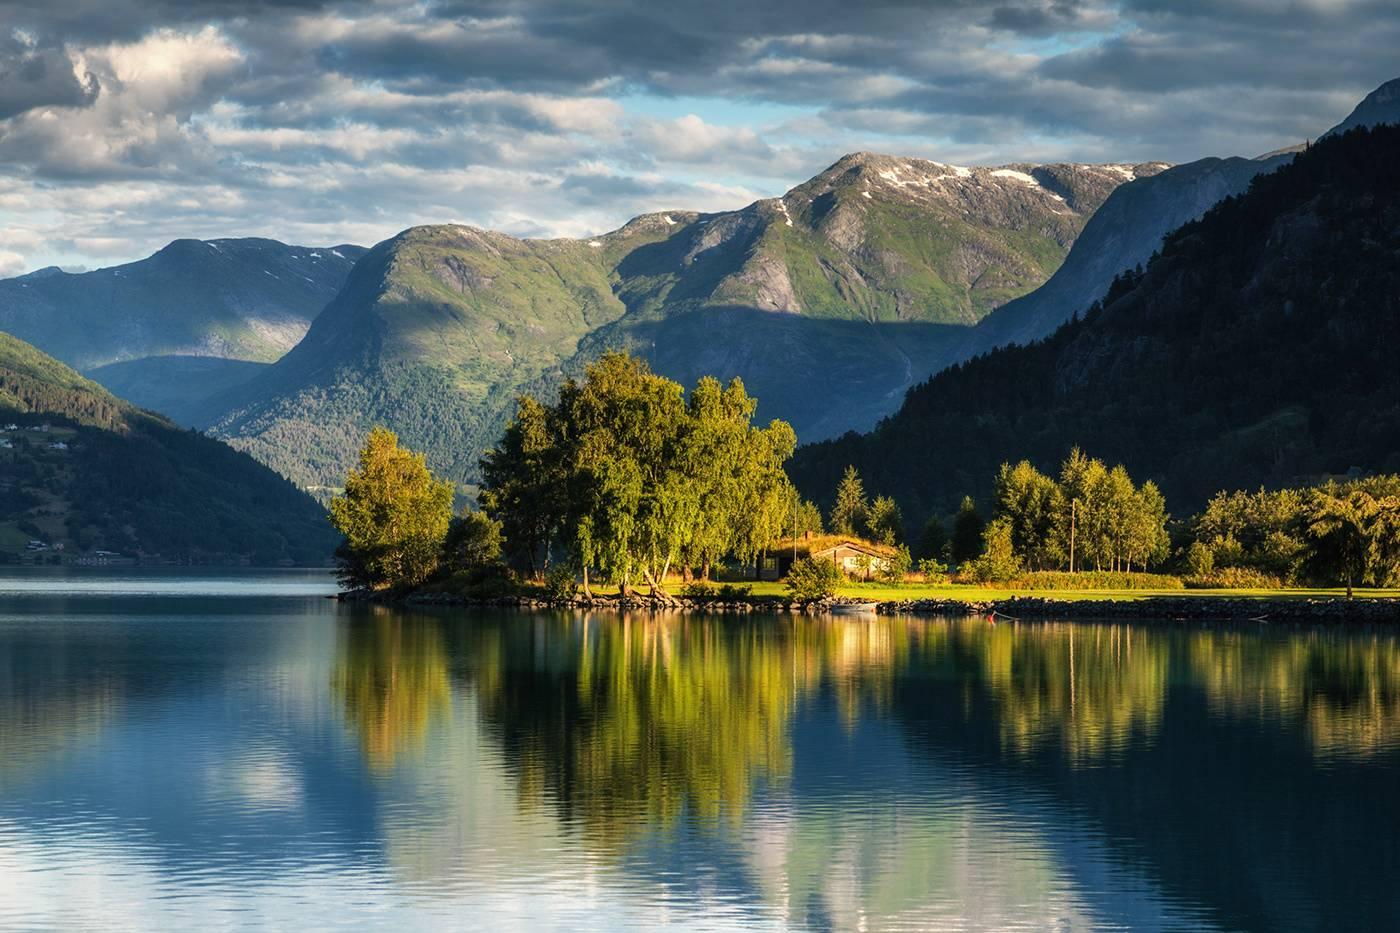 beautiful landscape photography norway by mikolaj gospodarek